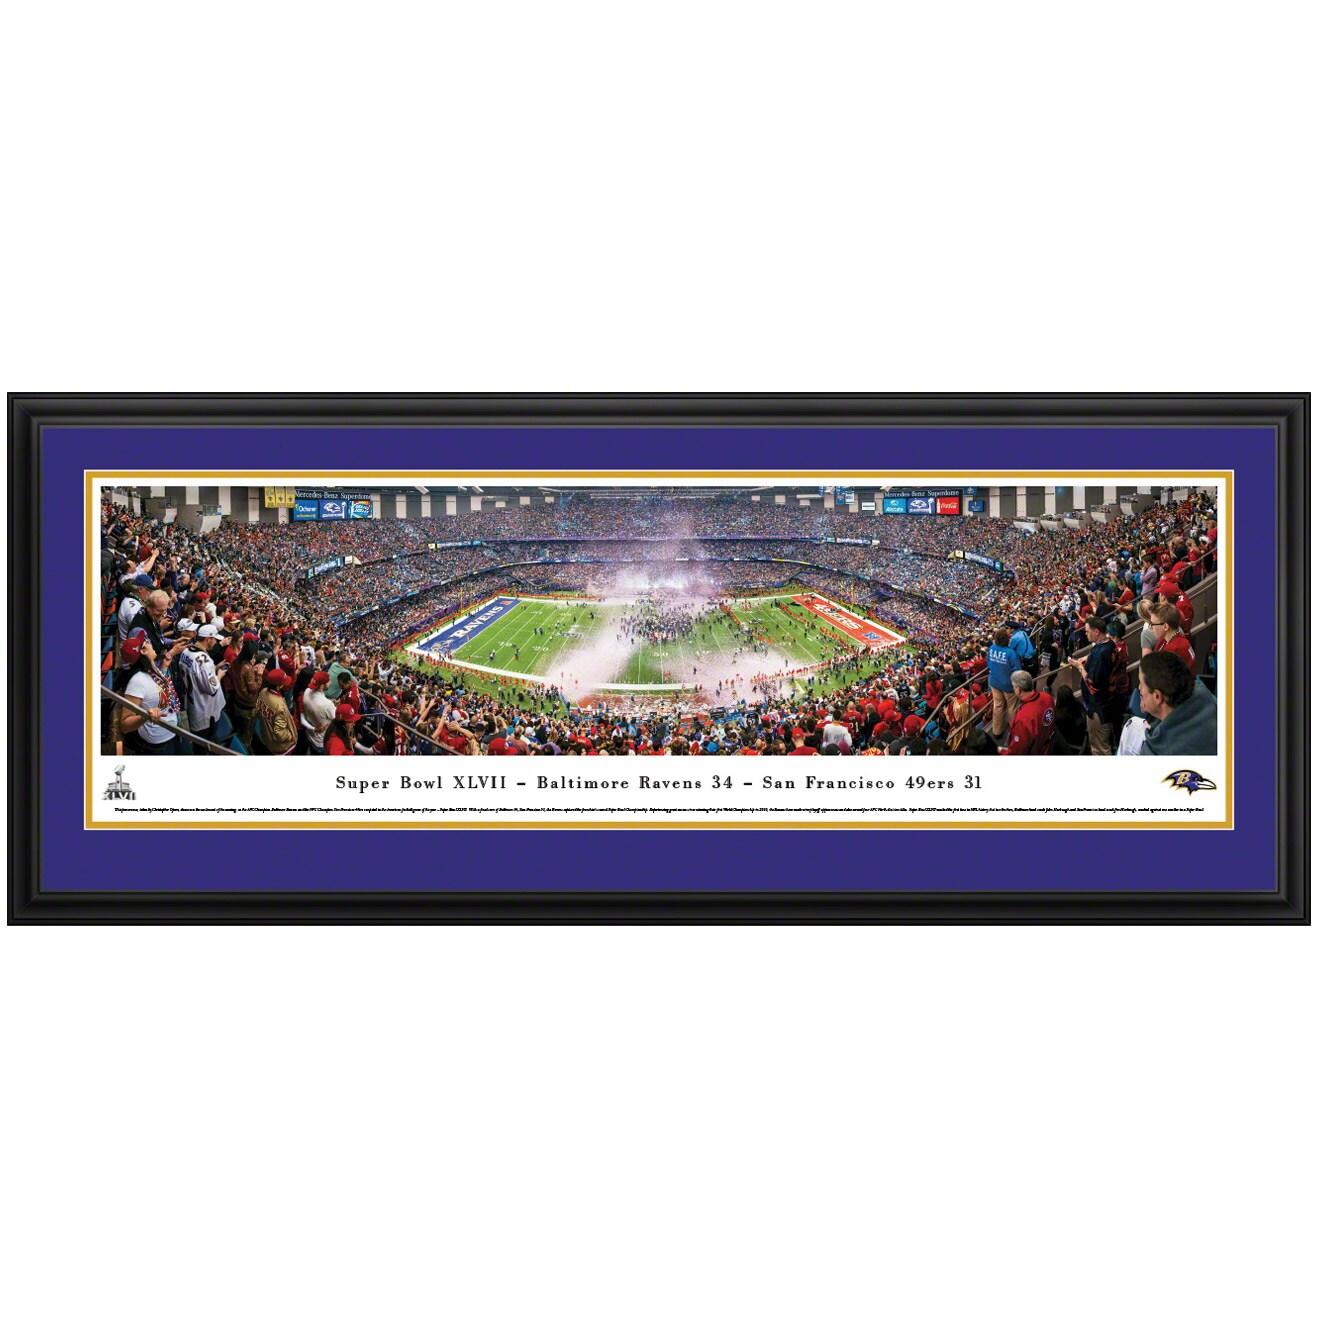 "Baltimore Ravens Super Bowl XLVII Champions 44"" x 18"" Deluxe Frame Panoramic Photo"